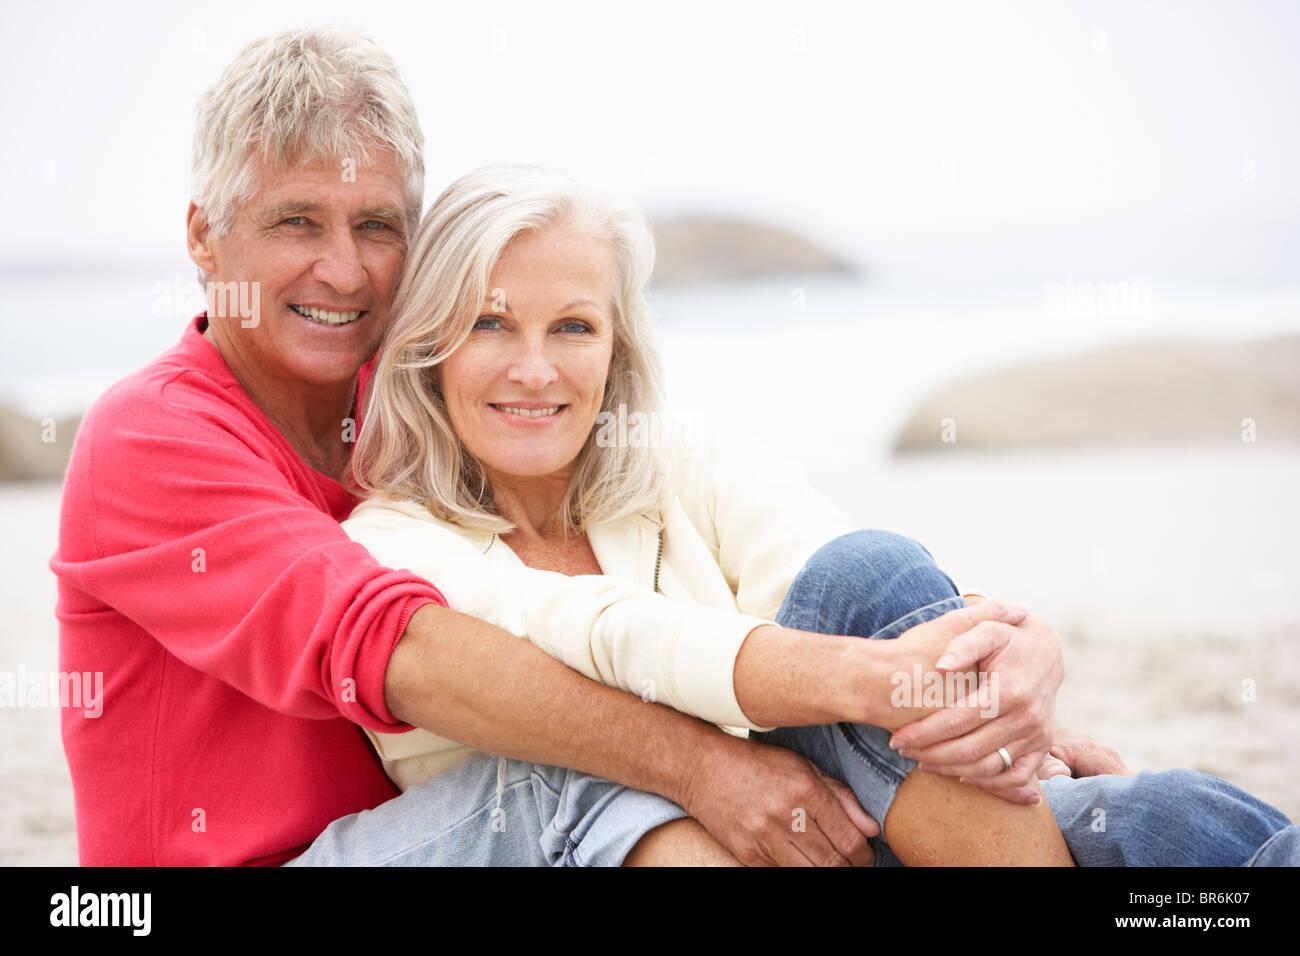 Senior Couple On Holiday Sitting On Winter Beach - Stock Image